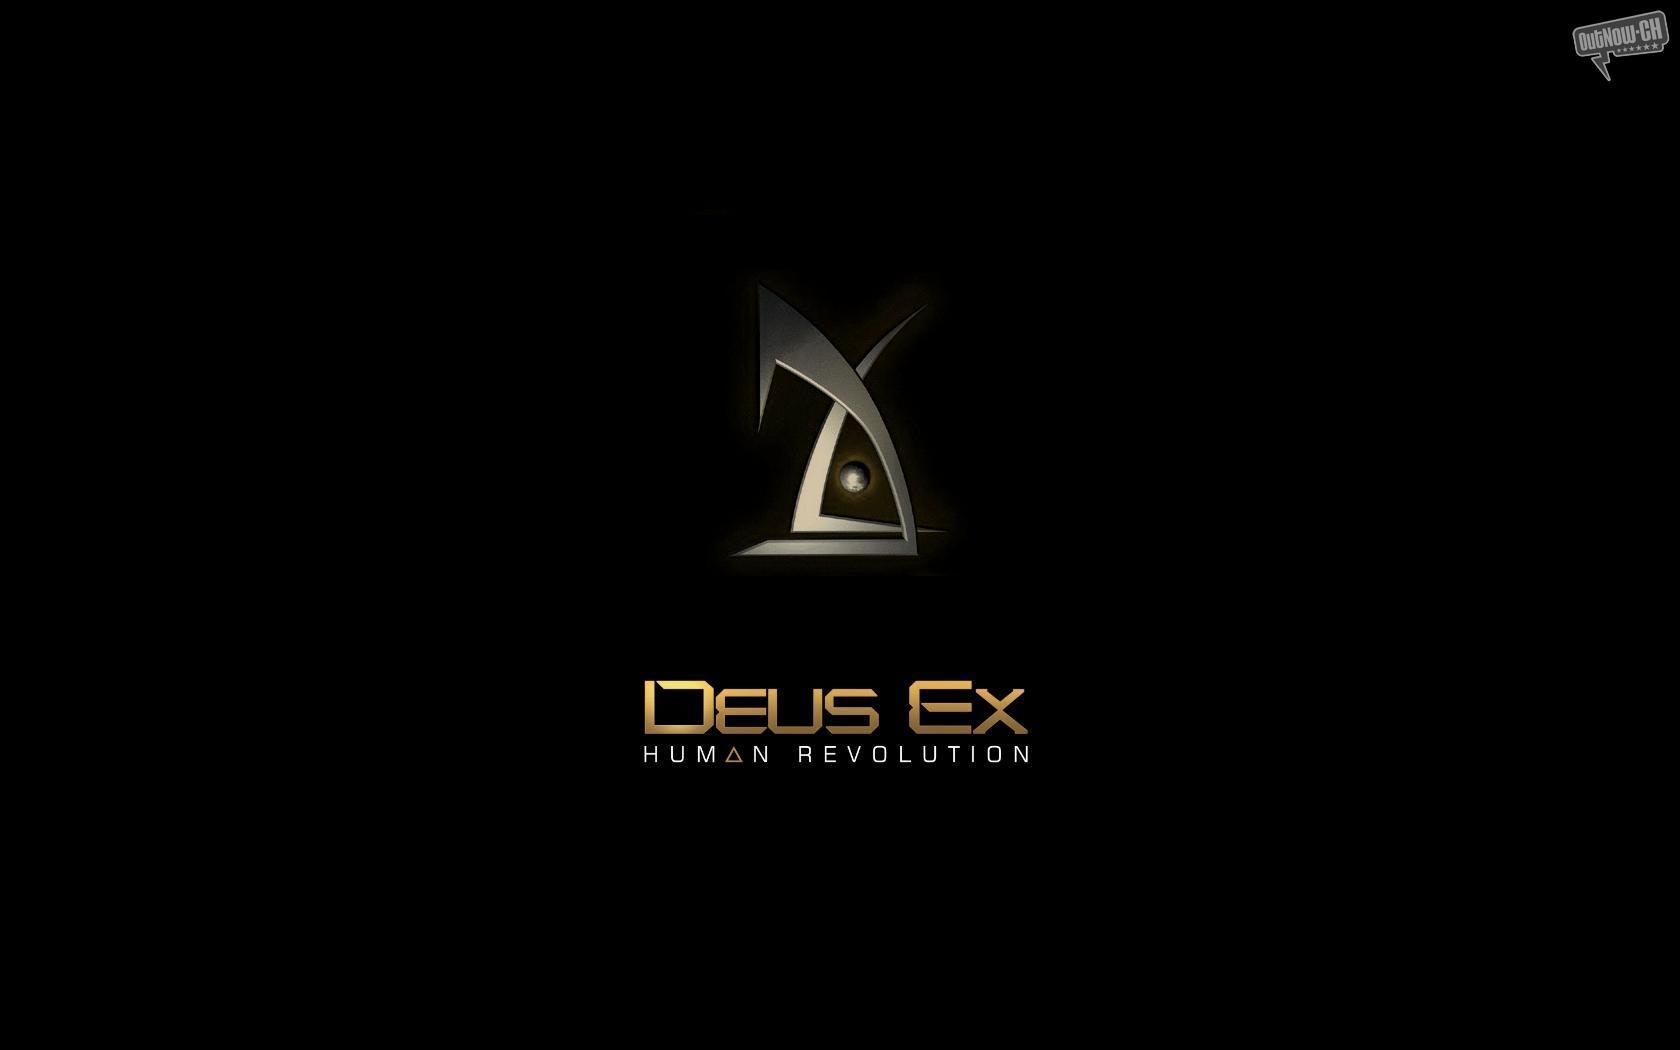 Deus Ex Human Revolution wallpapers Deus Ex Human 1680x1050